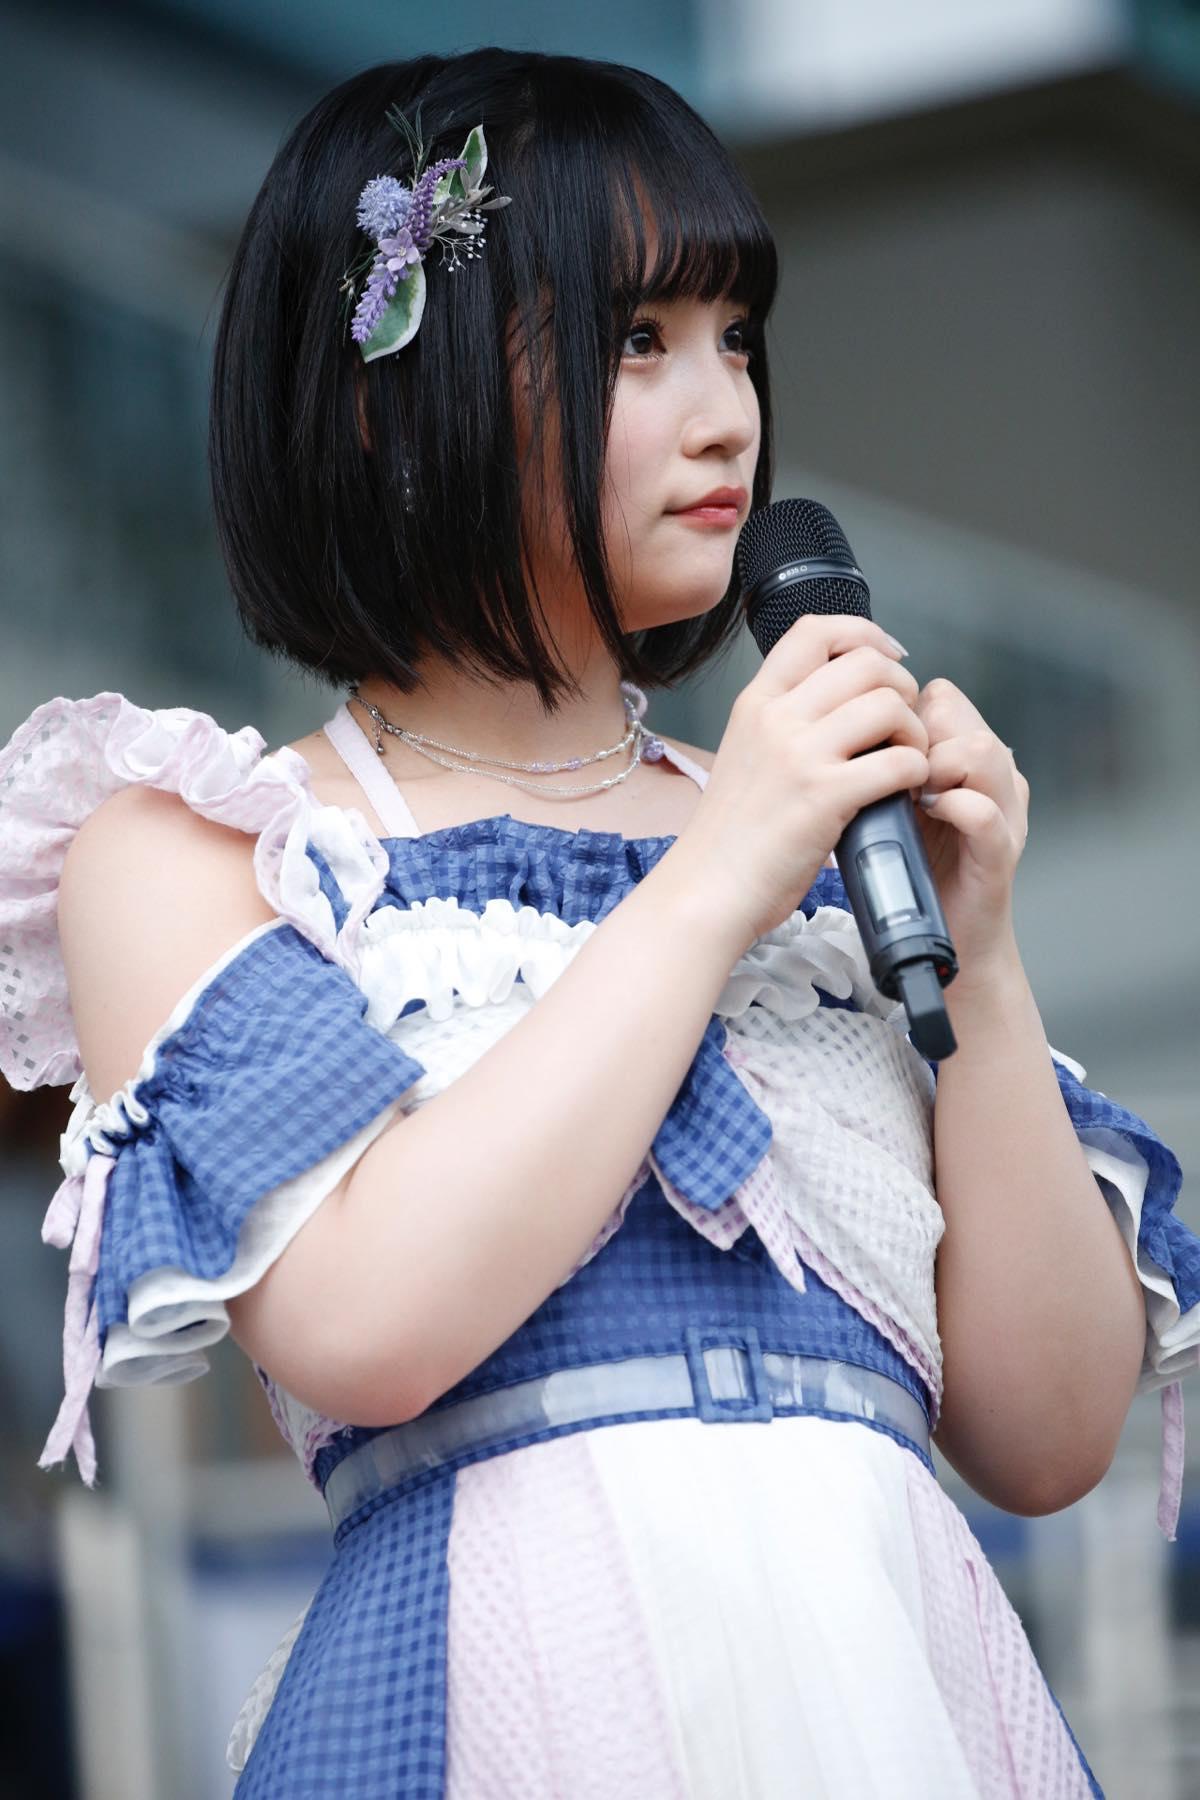 AKB48矢作萌夏、堂々のセンターで新曲『サステナブル』を披露!【画像15枚】の画像008